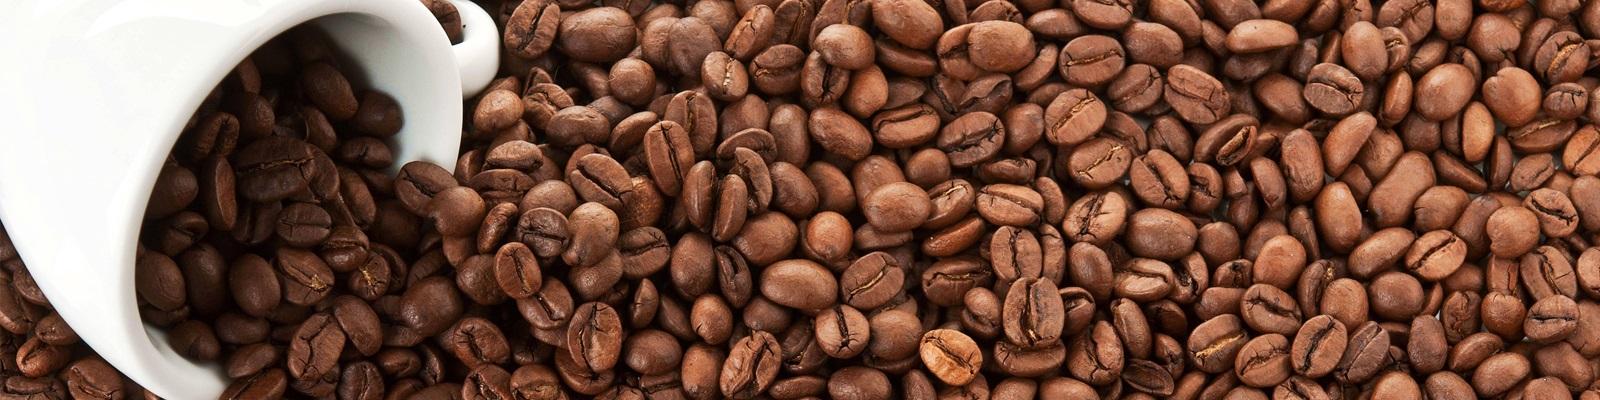 slide 1 - cekirdek kahve